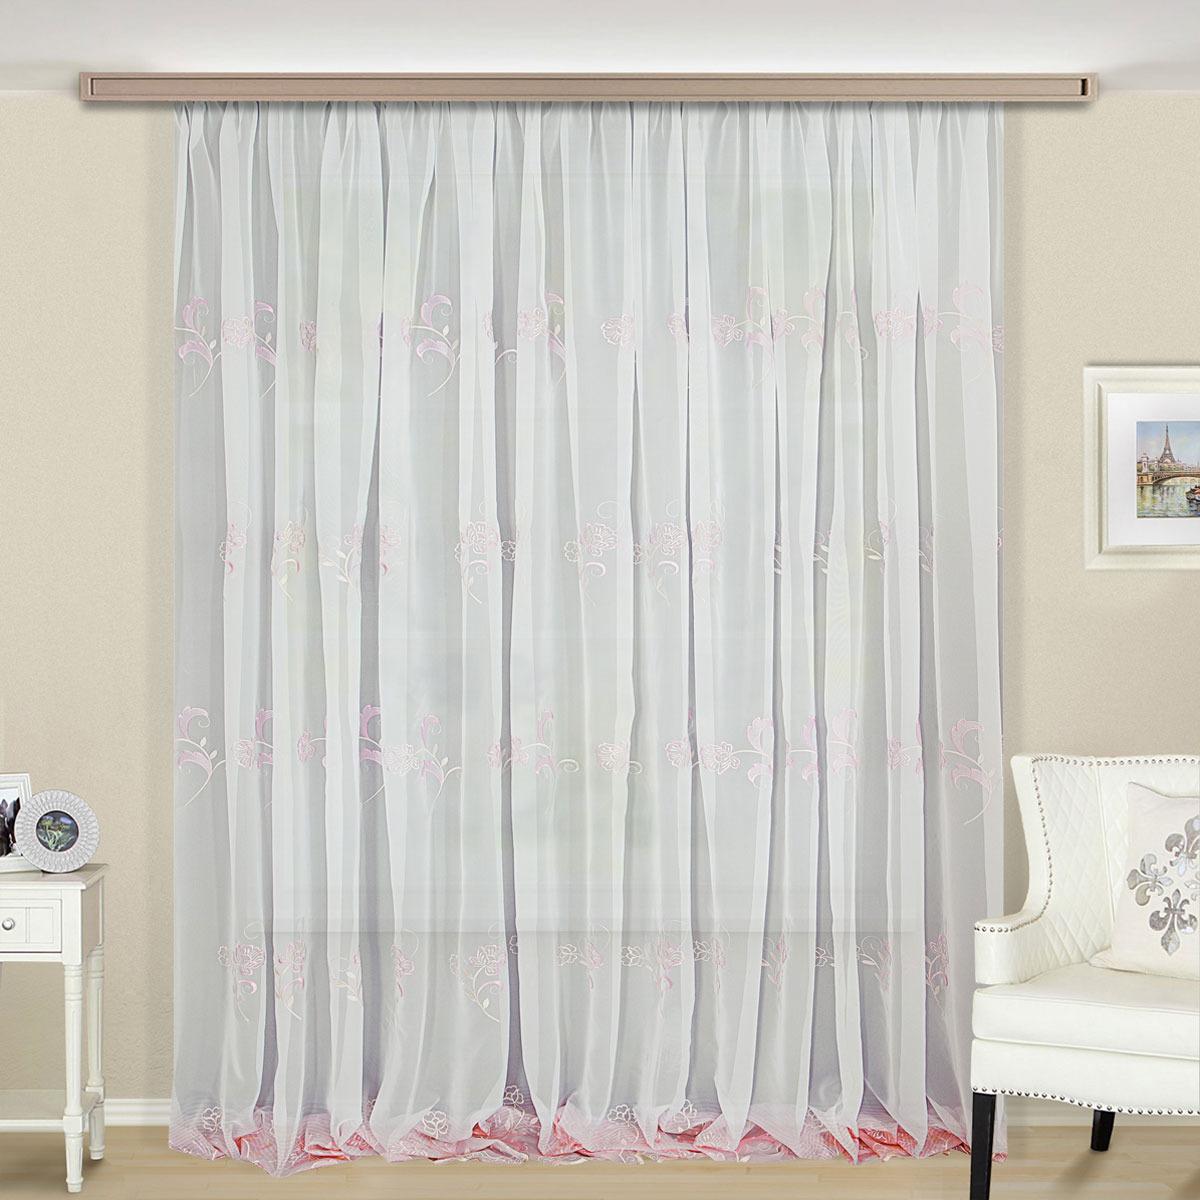 Тюль ТД Текстиль Элегия, на ленте, цвет: белый, розовый, 500 х 270 см цена